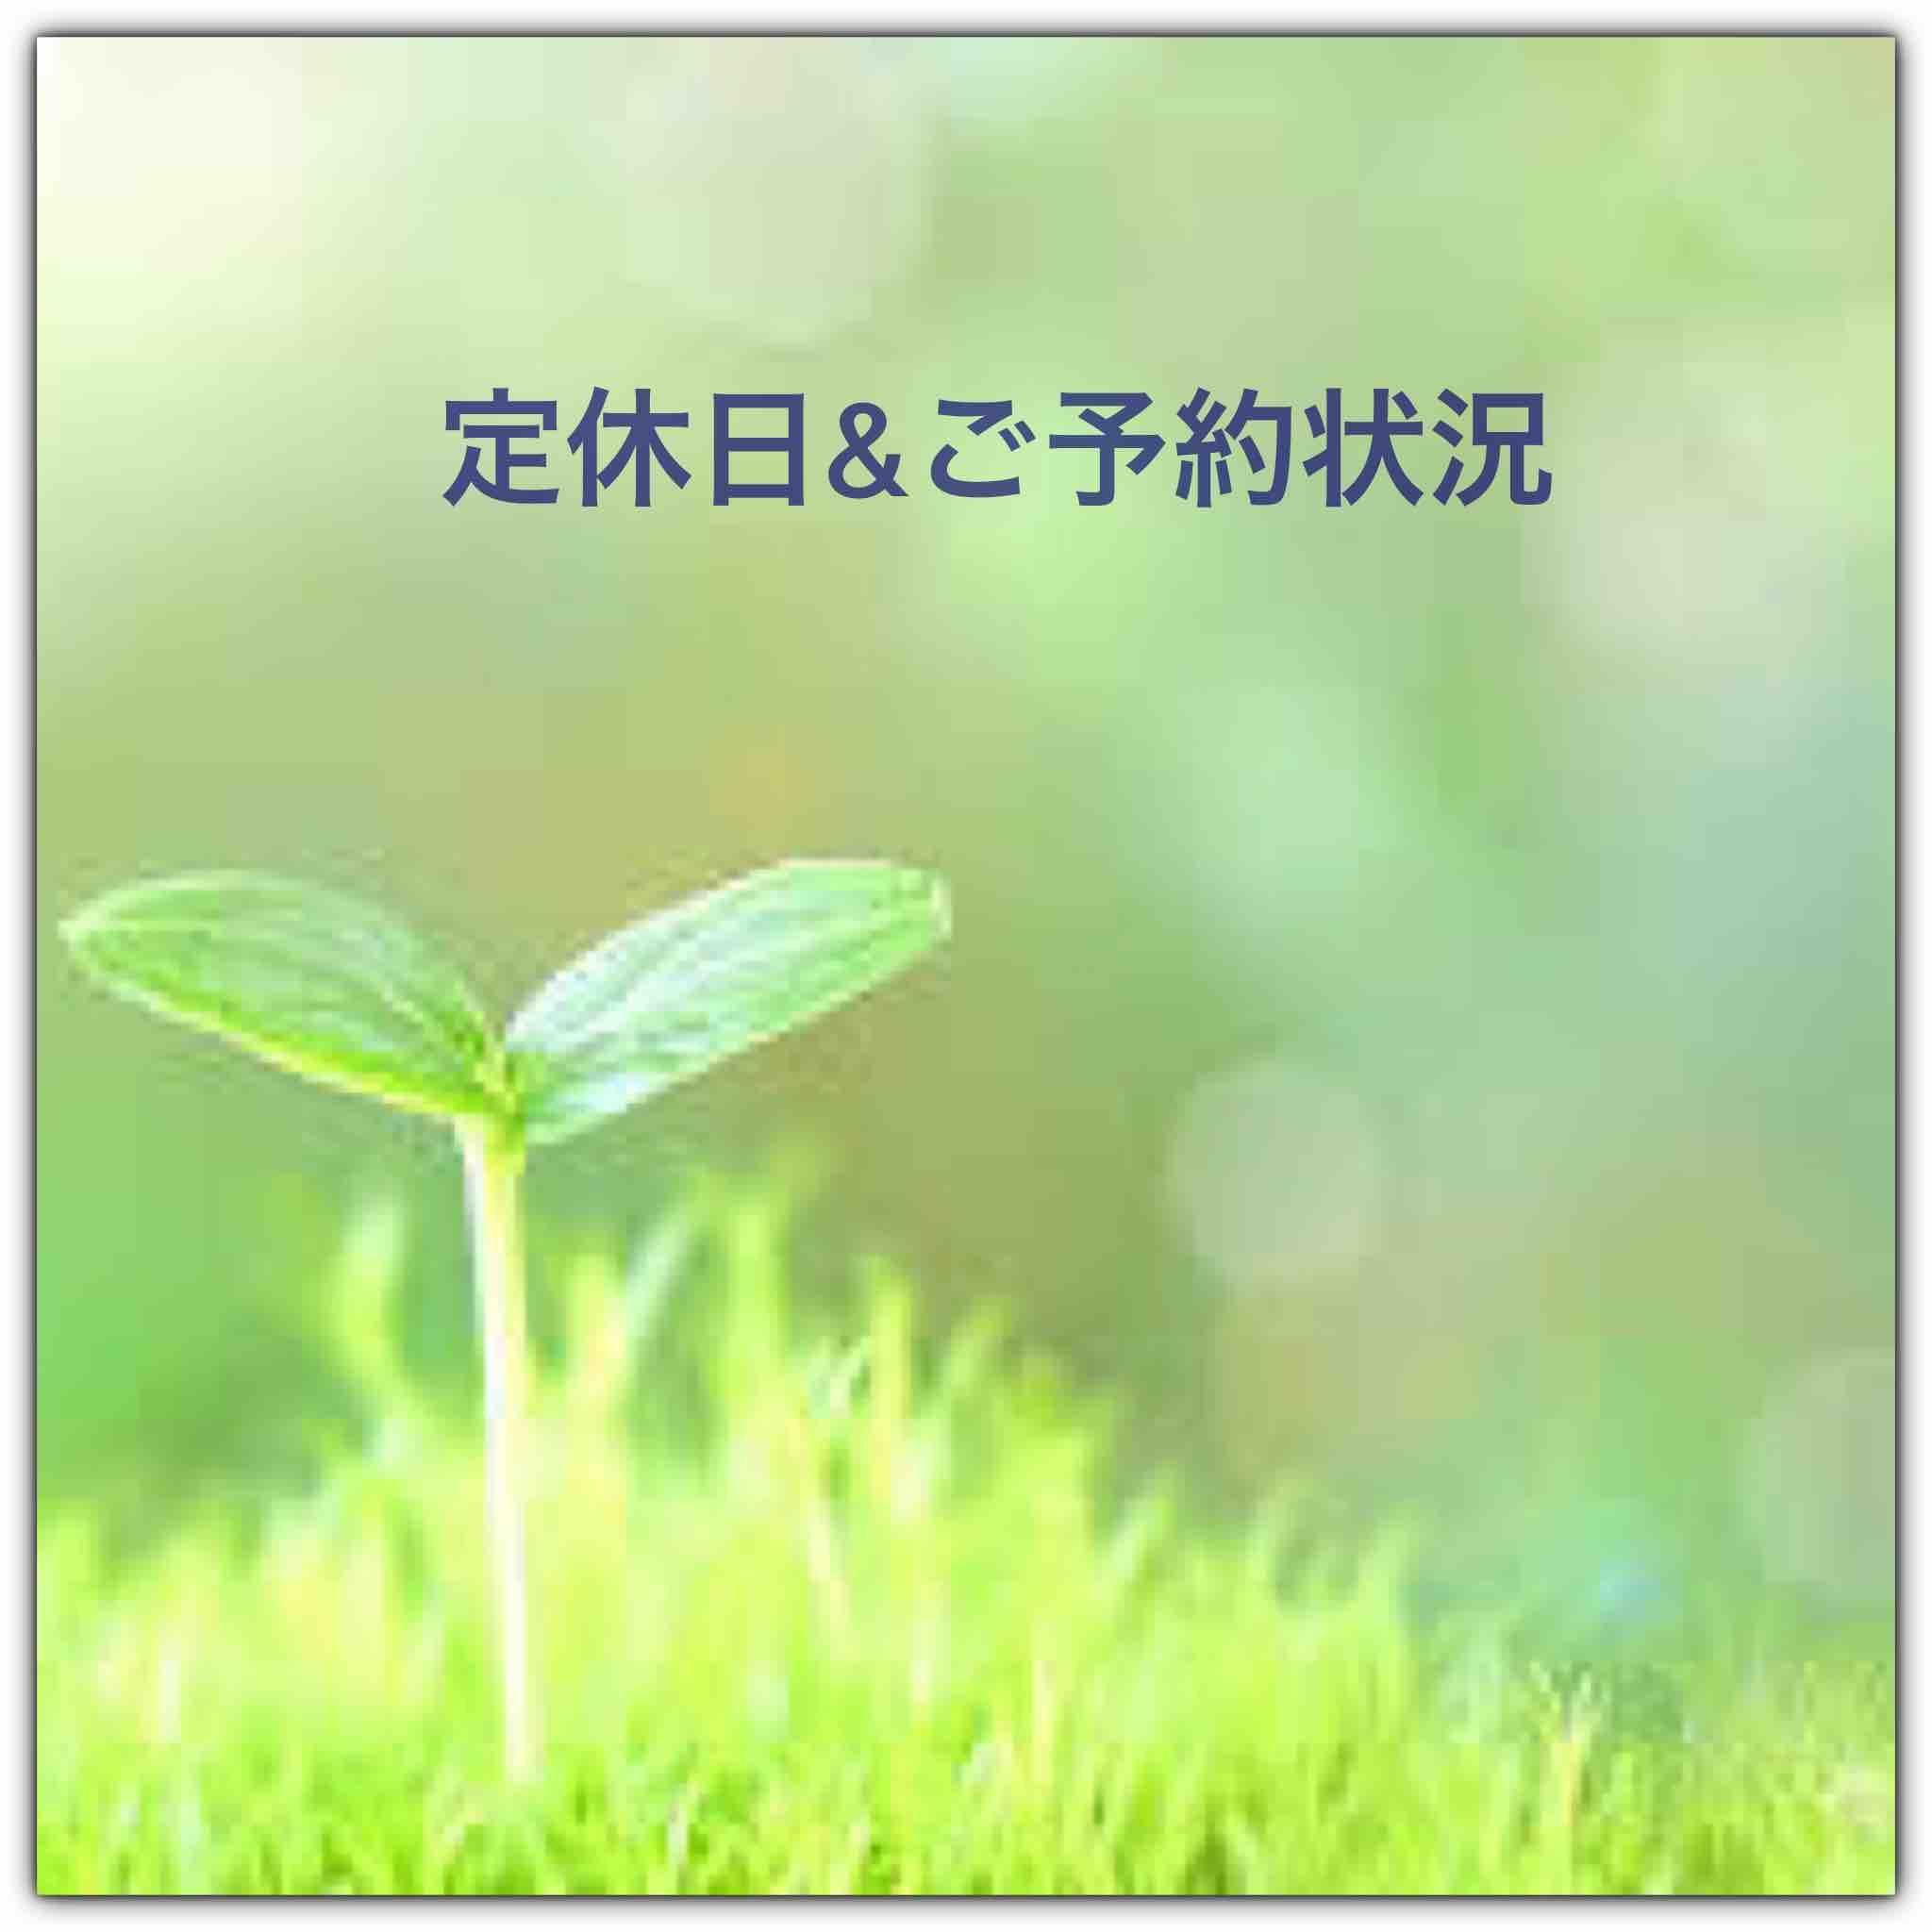 fc2blog_20181201022722286.jpg